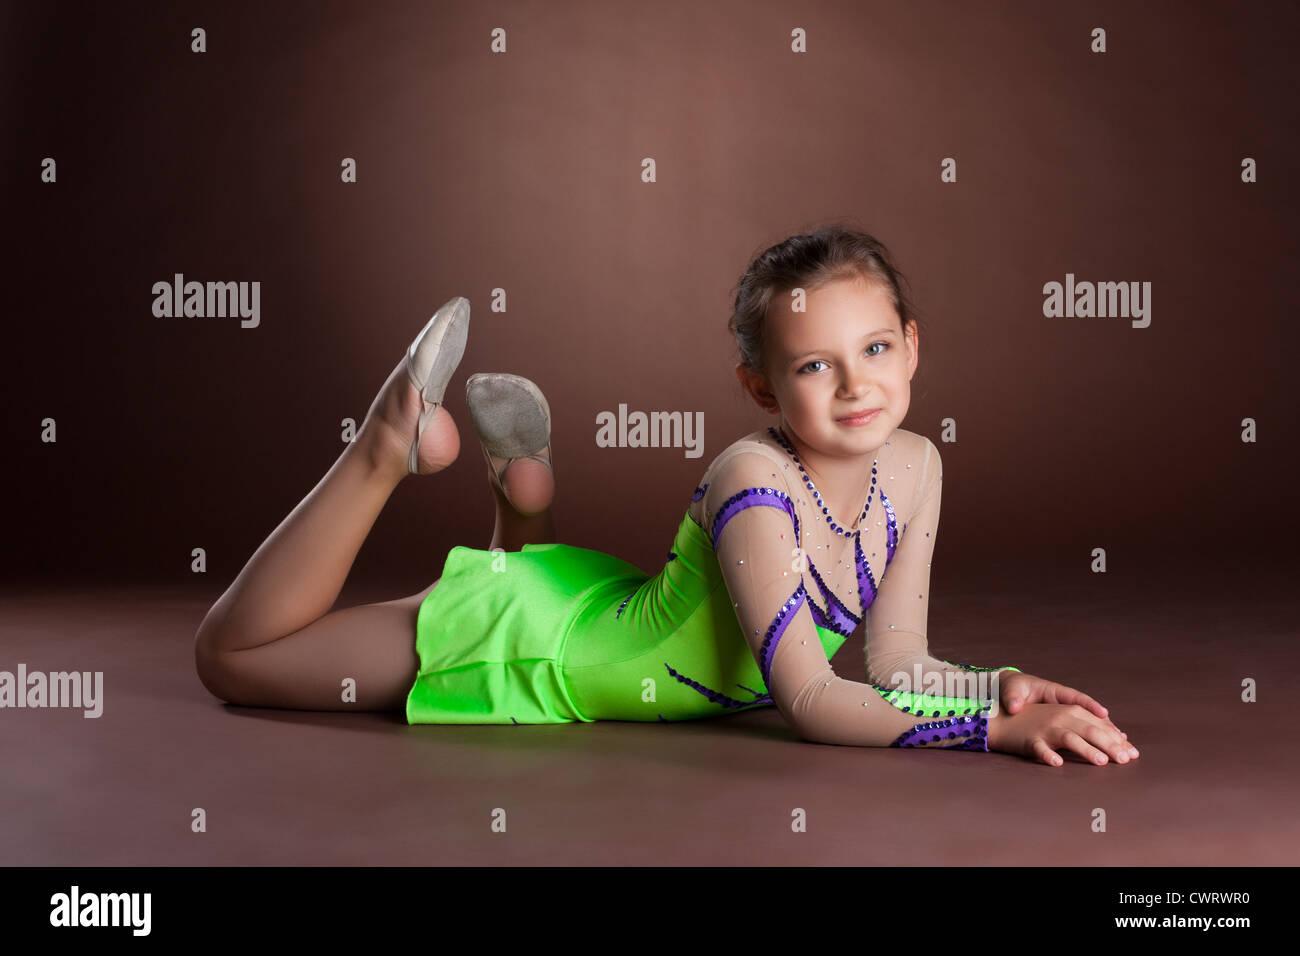 Version Girl gymnastics teen remarkable